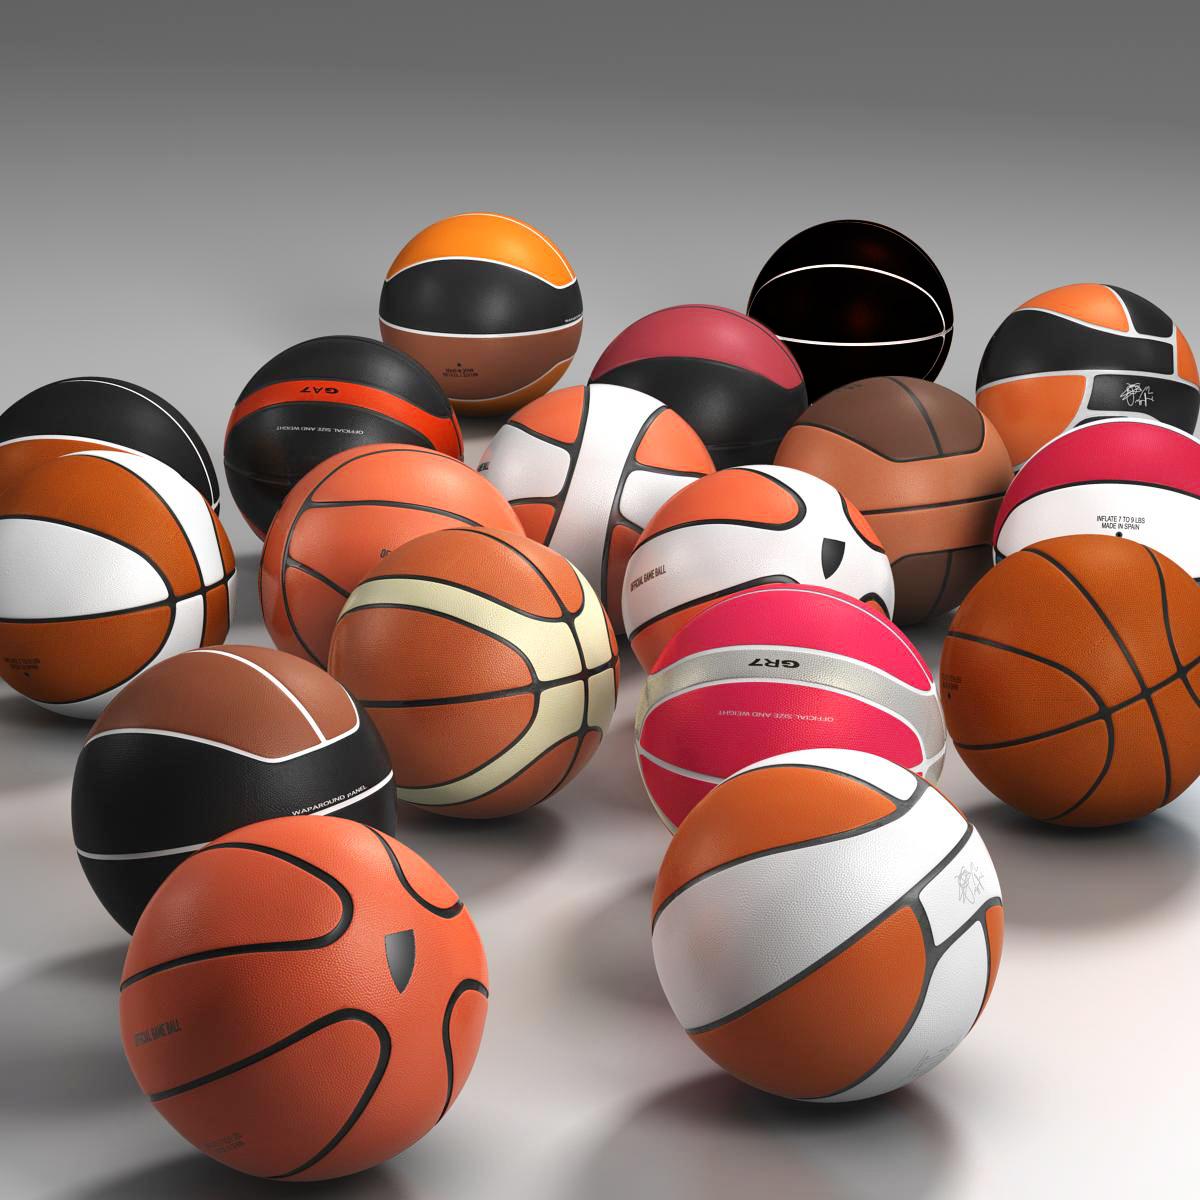 basketbola bumbu komplekts 3d modelis 3ds max fbx c4d ma mb obj 165935